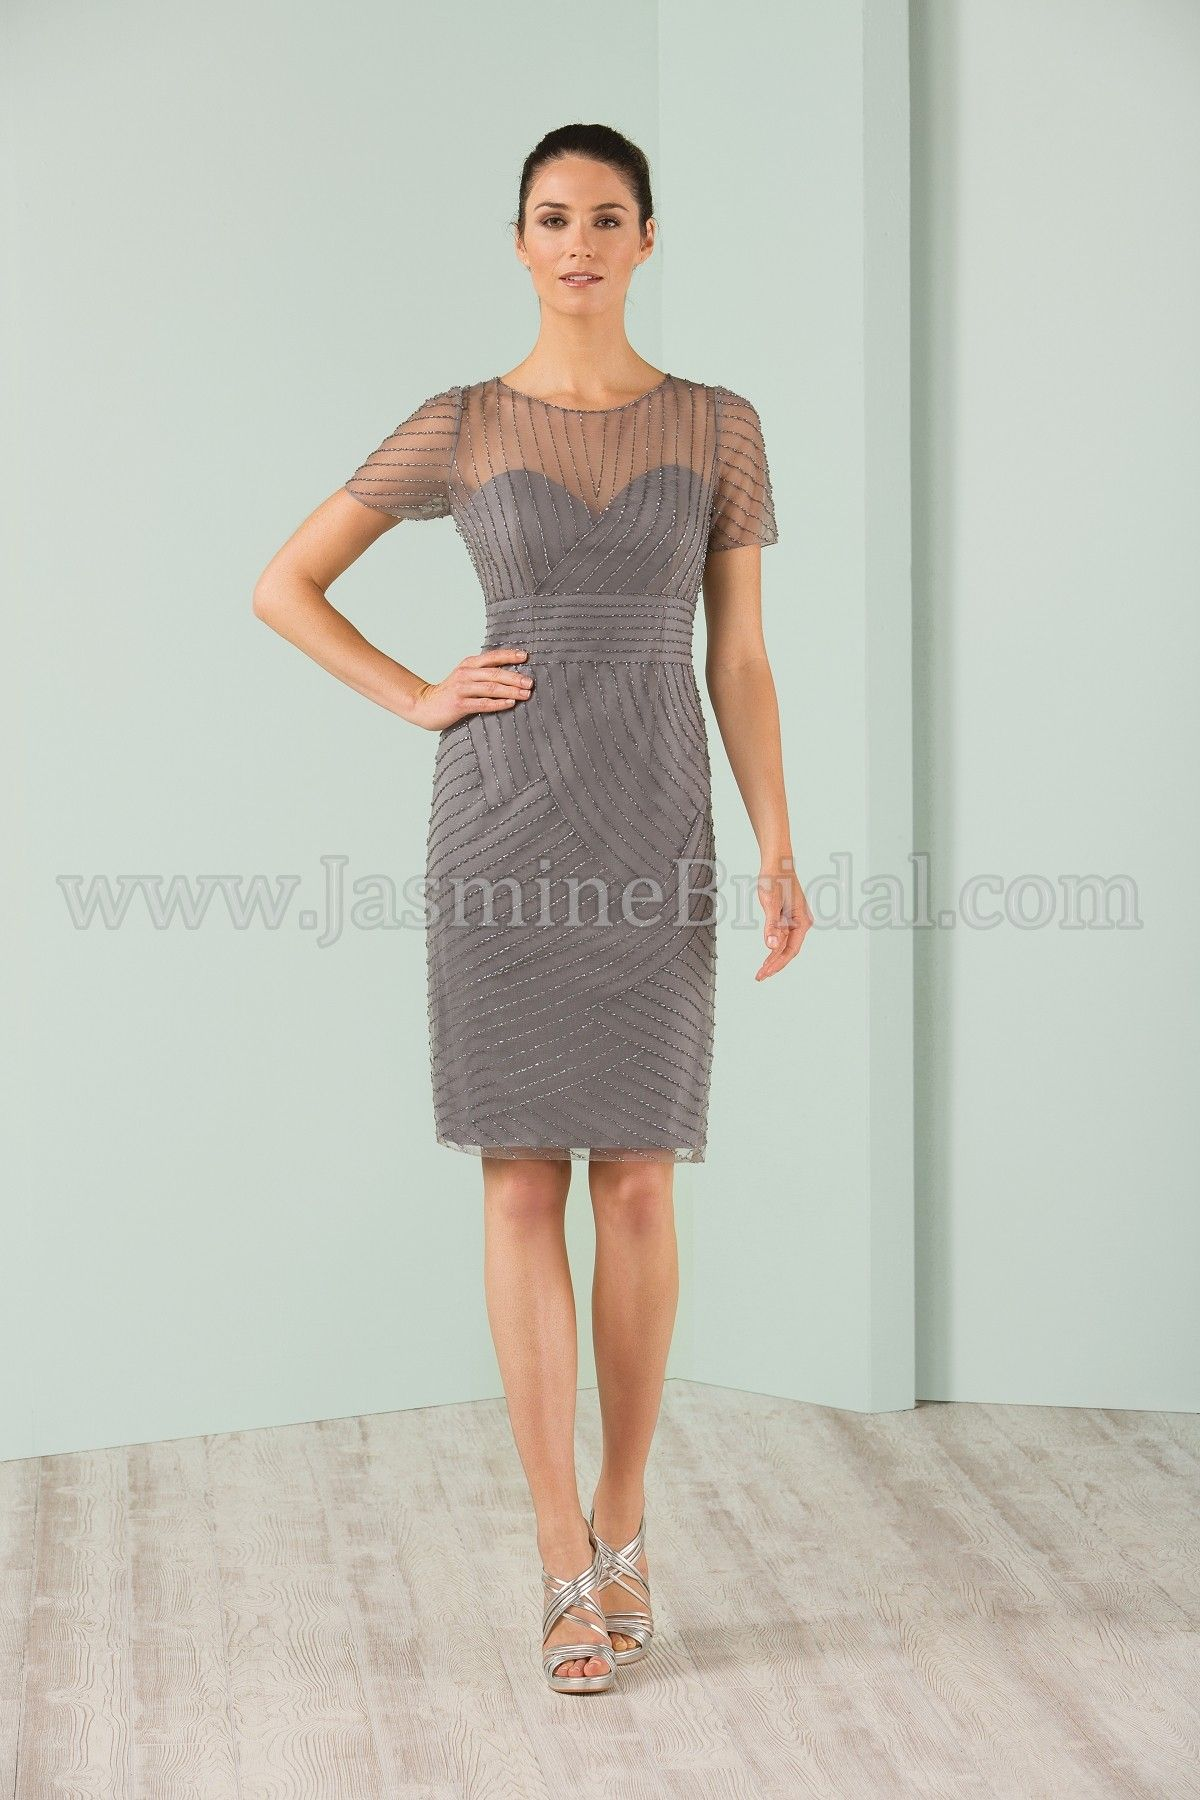 Jasmine Bridal Jasmine Black Label Style M180003 in Platinum ...